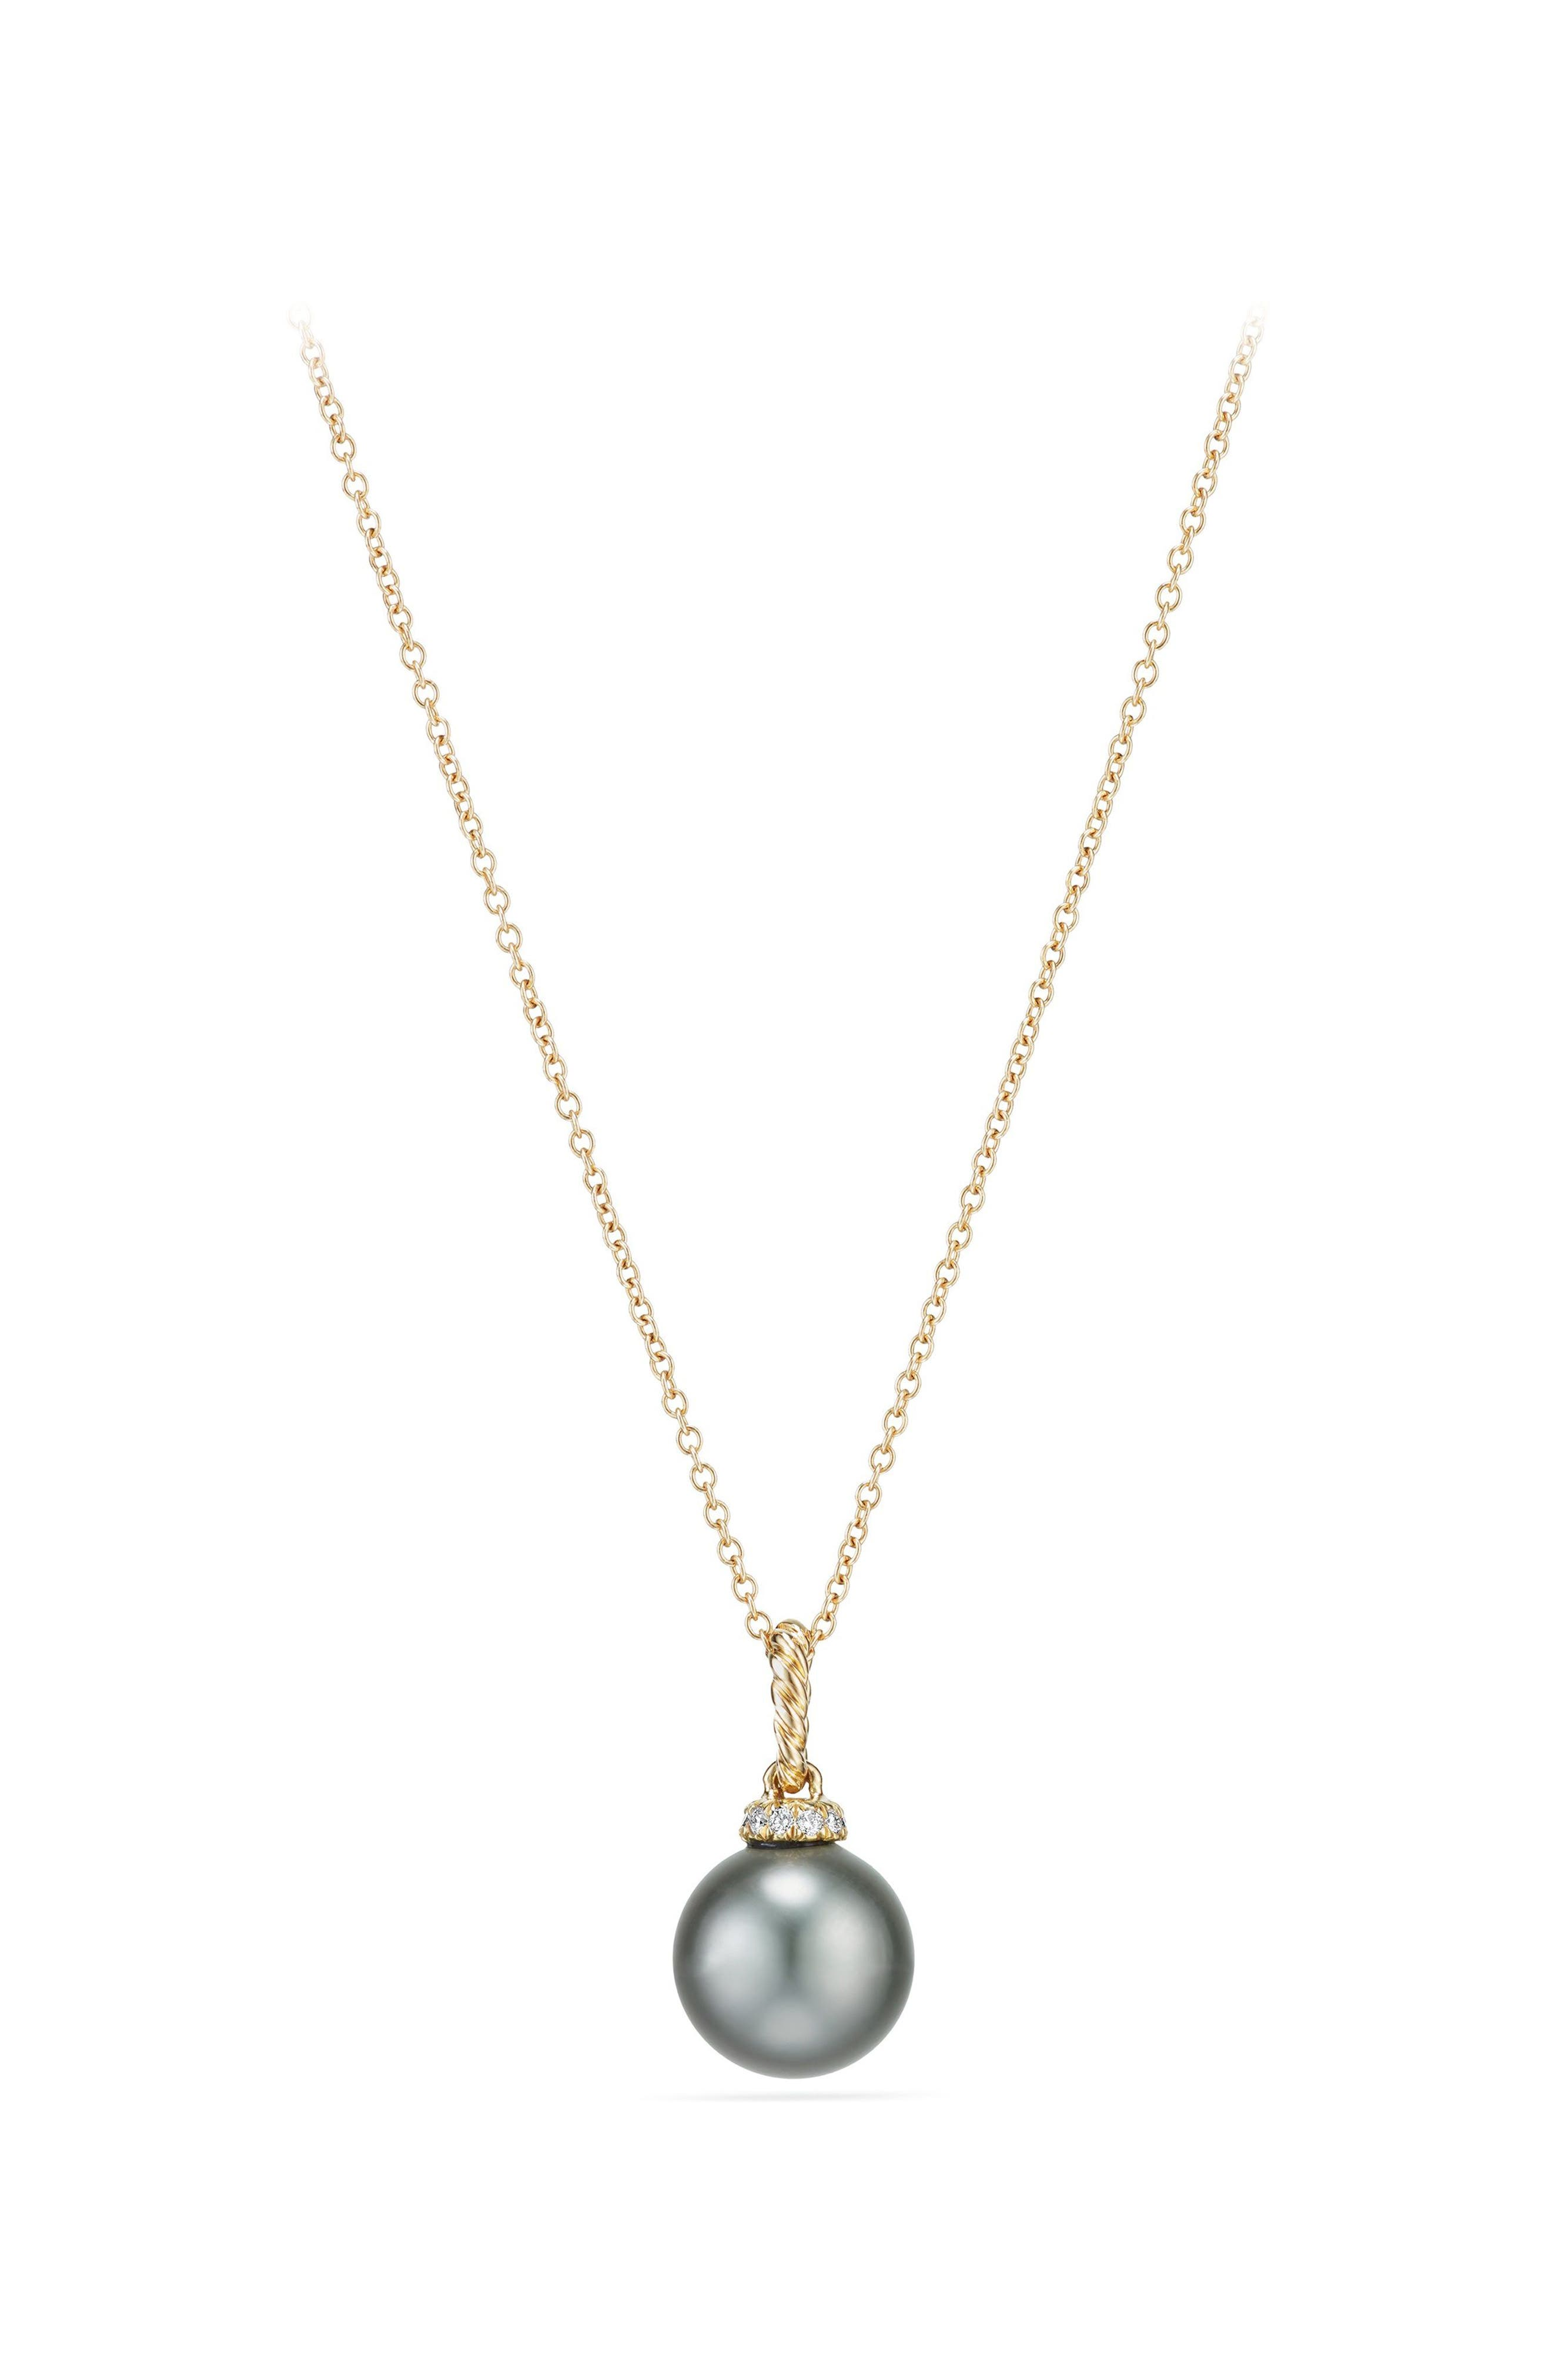 Solari Pendant Necklace with Diamonds,                             Main thumbnail 1, color,                             GOLD/ DIAMOND/ GREY PEARL